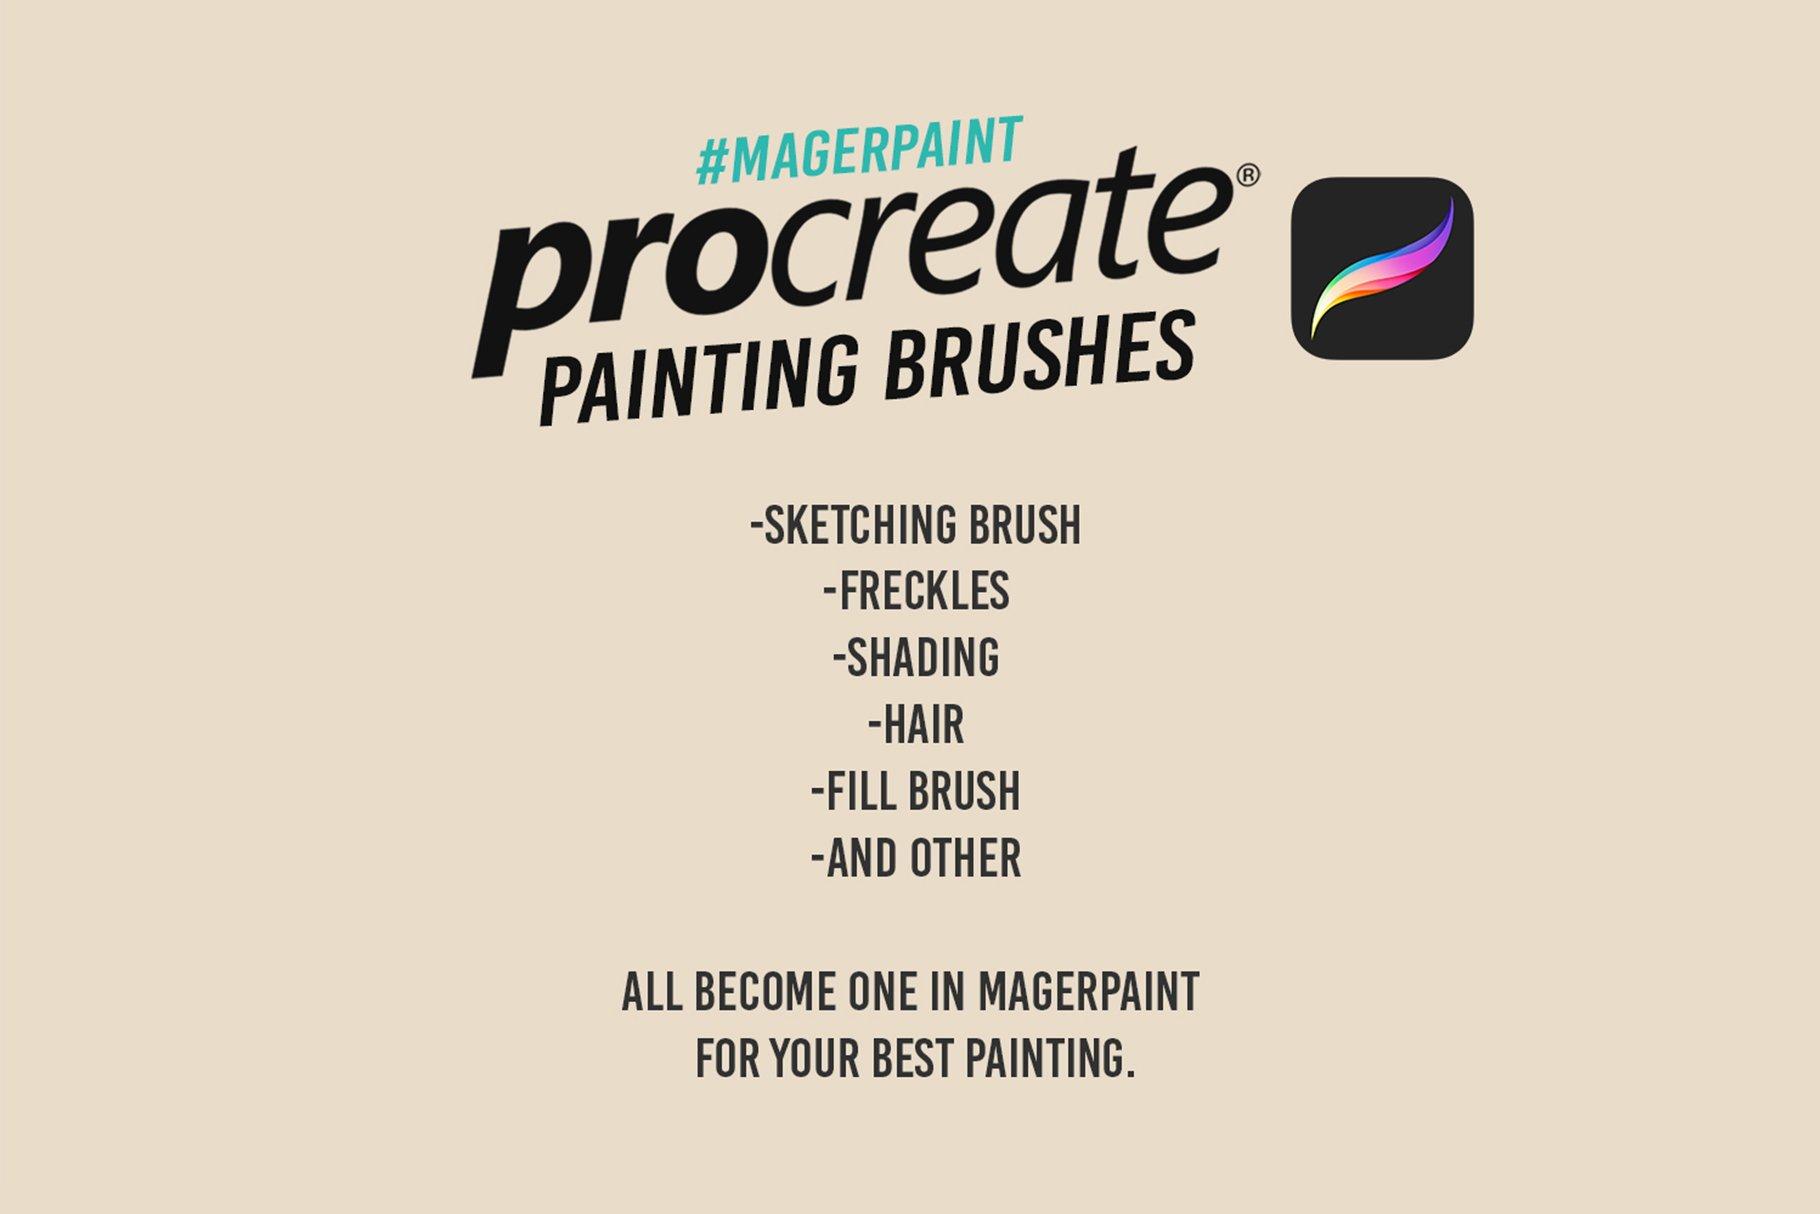 20款噪点颗粒艺术绘画iPadProcreate笔刷素材 MAGERPAINT – Procreate Brushes插图3